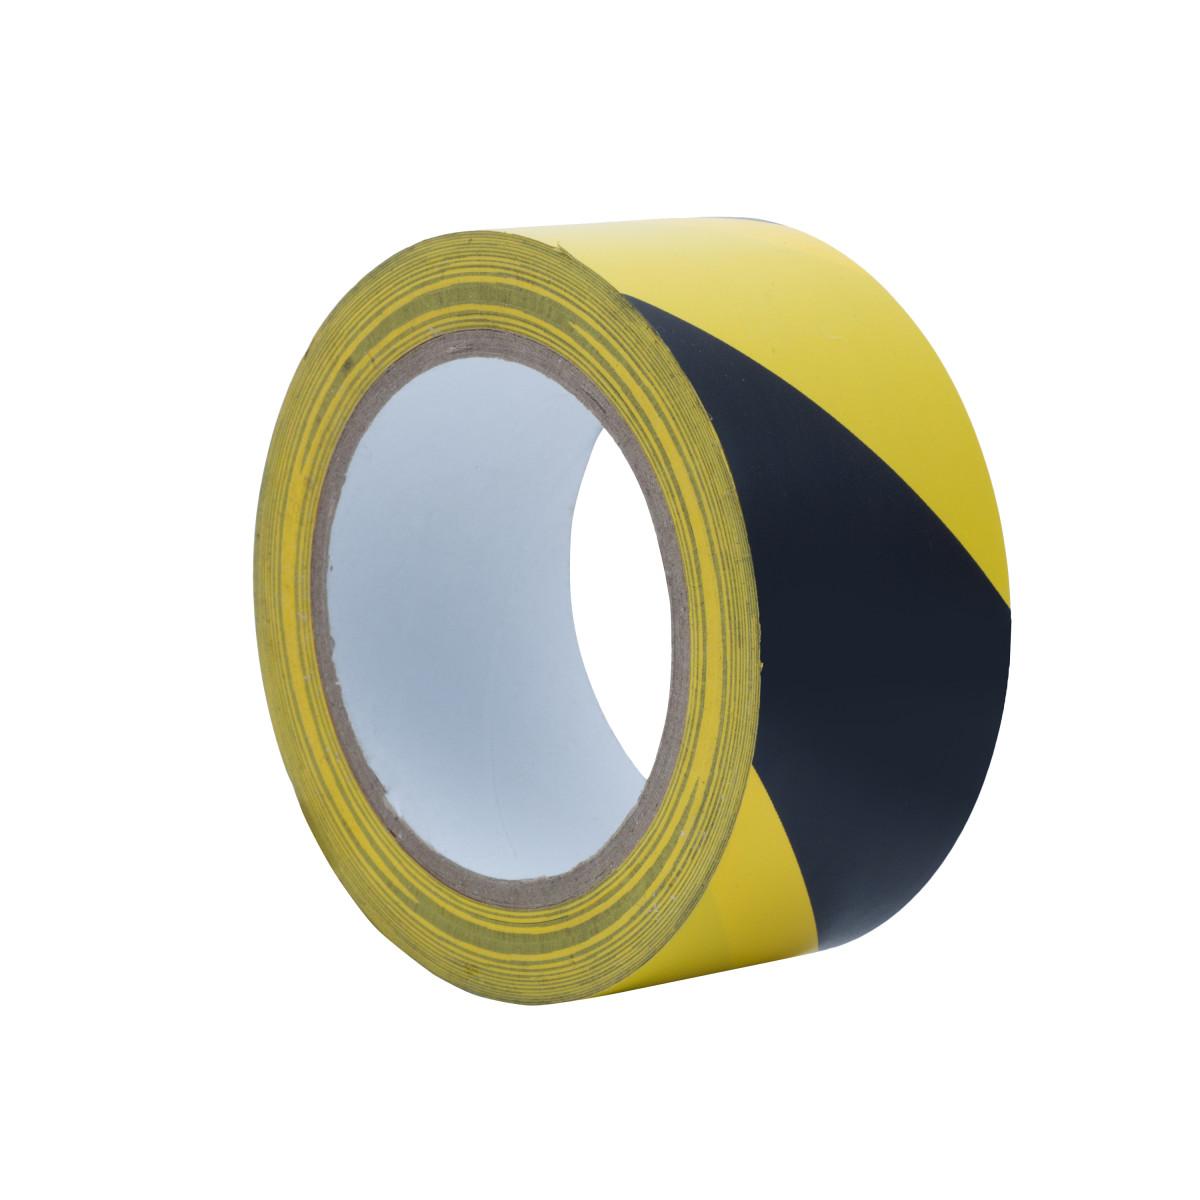 Лента разметочная Standers самоклеящаяся 50 мм x 33 м цвет чёрный/жёлтый